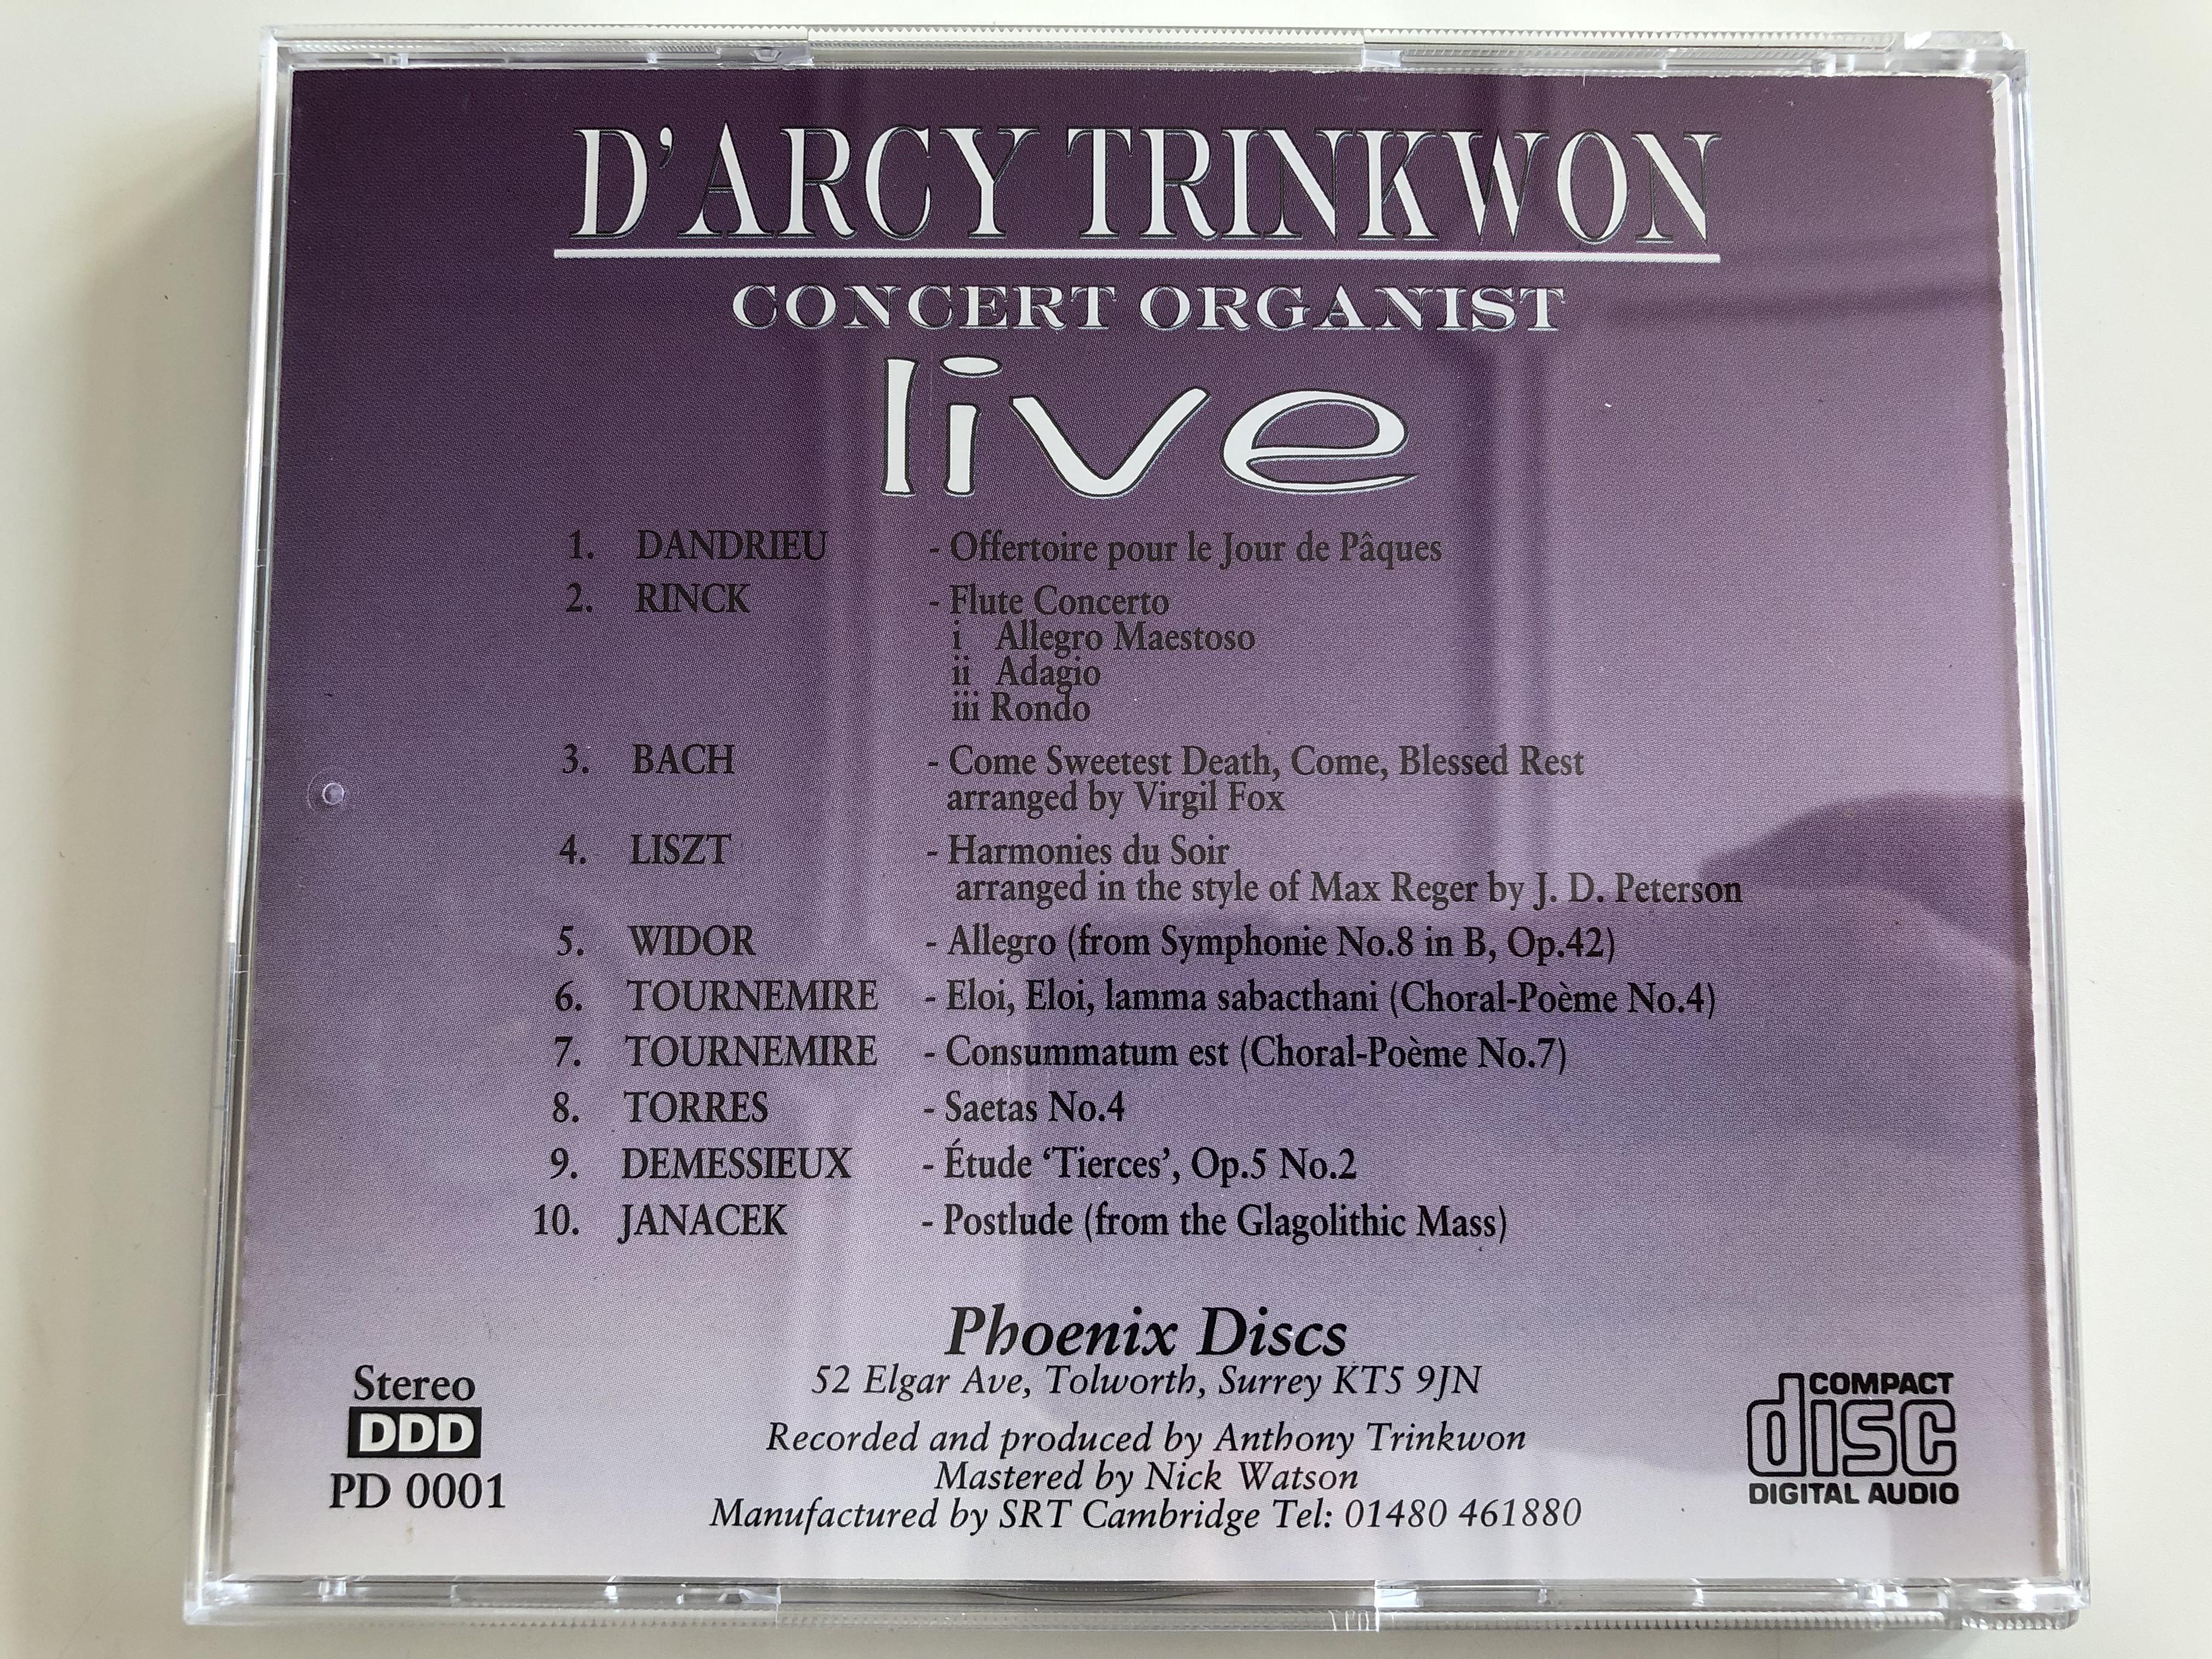 d-arcy-trinkwon-concert-organist-live-phoenix-discs-audio-cd-stereo-pd-0001-7-.jpg